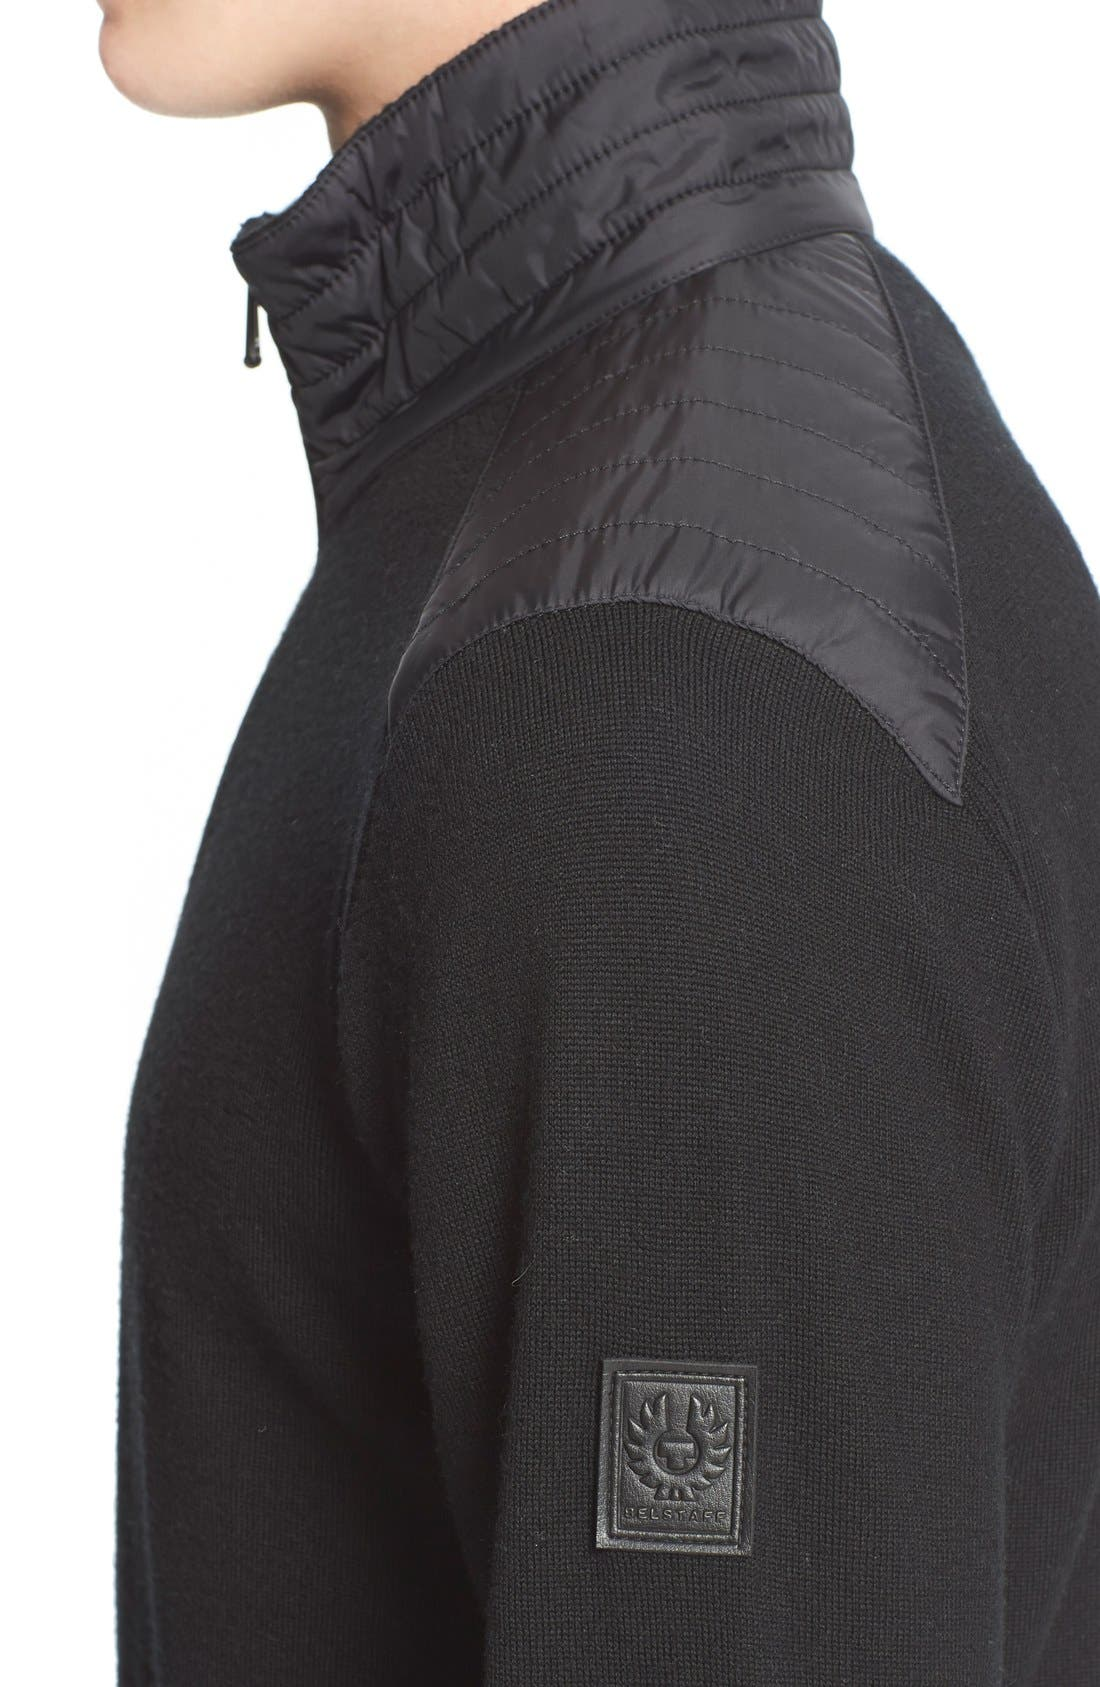 'Kelby' Full Zip Wool Sweater,                             Alternate thumbnail 4, color,                             Black